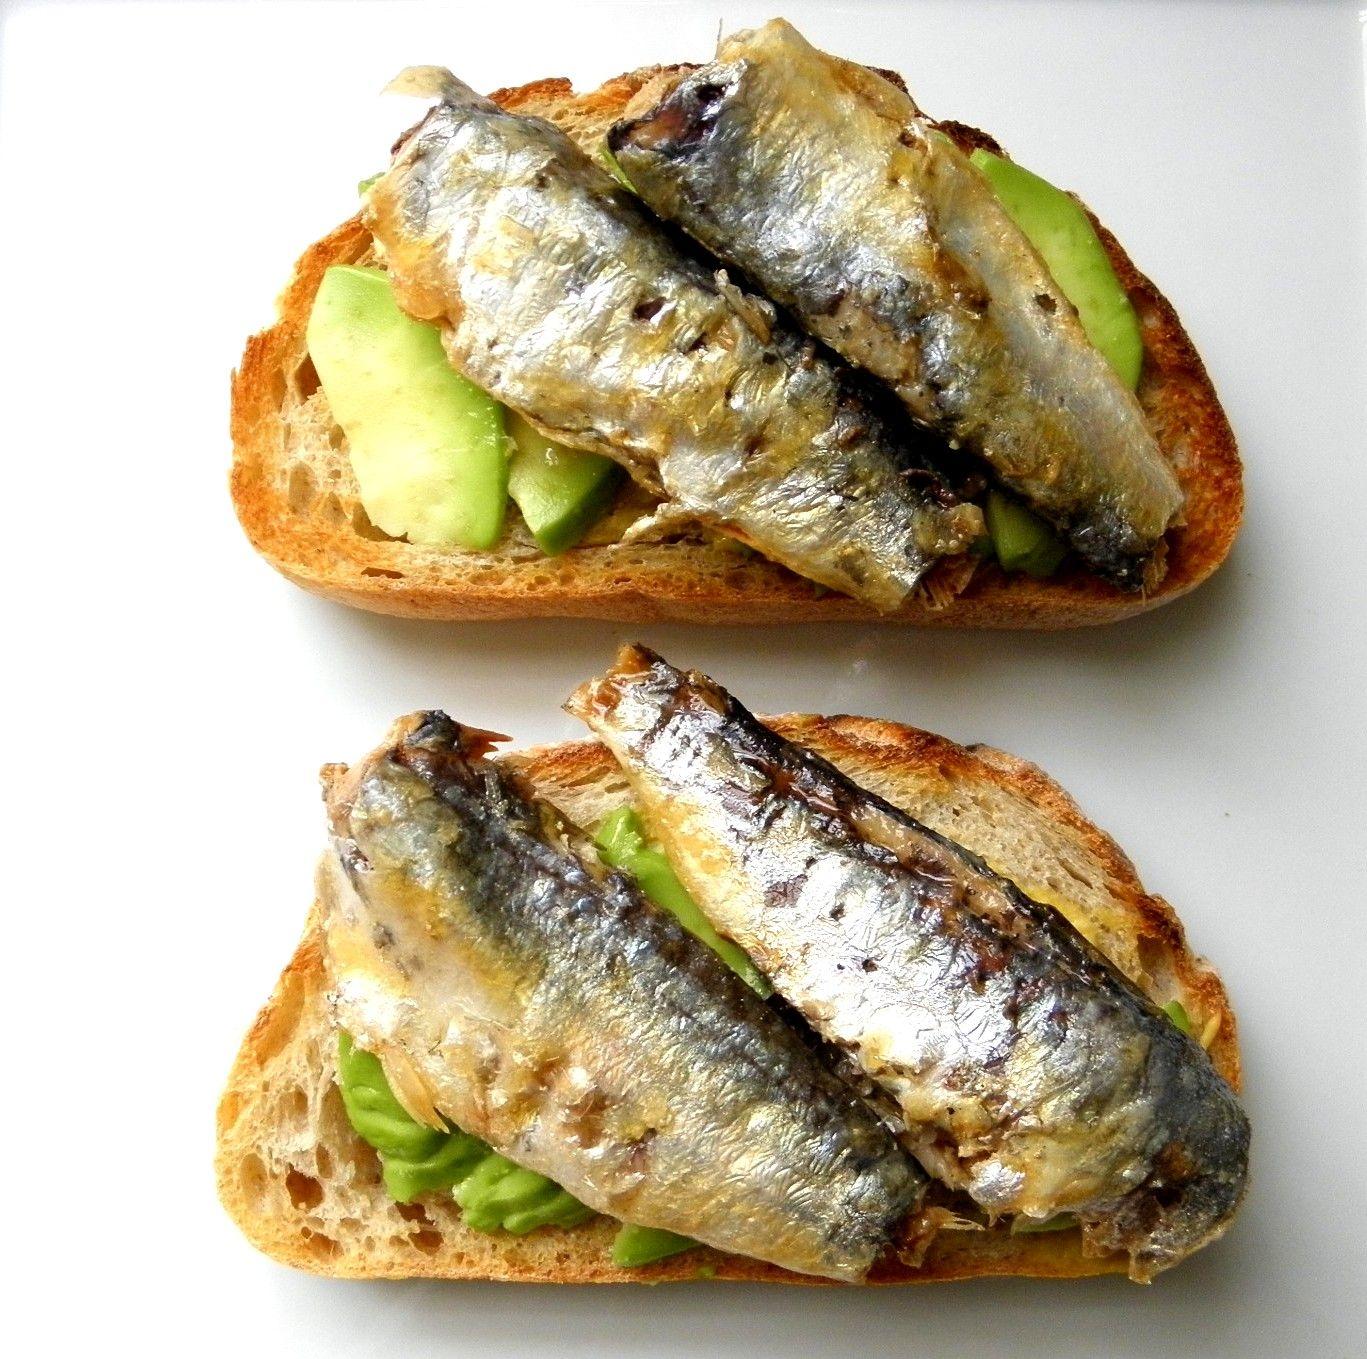 sardine avocado toasts with a medium cooked egg